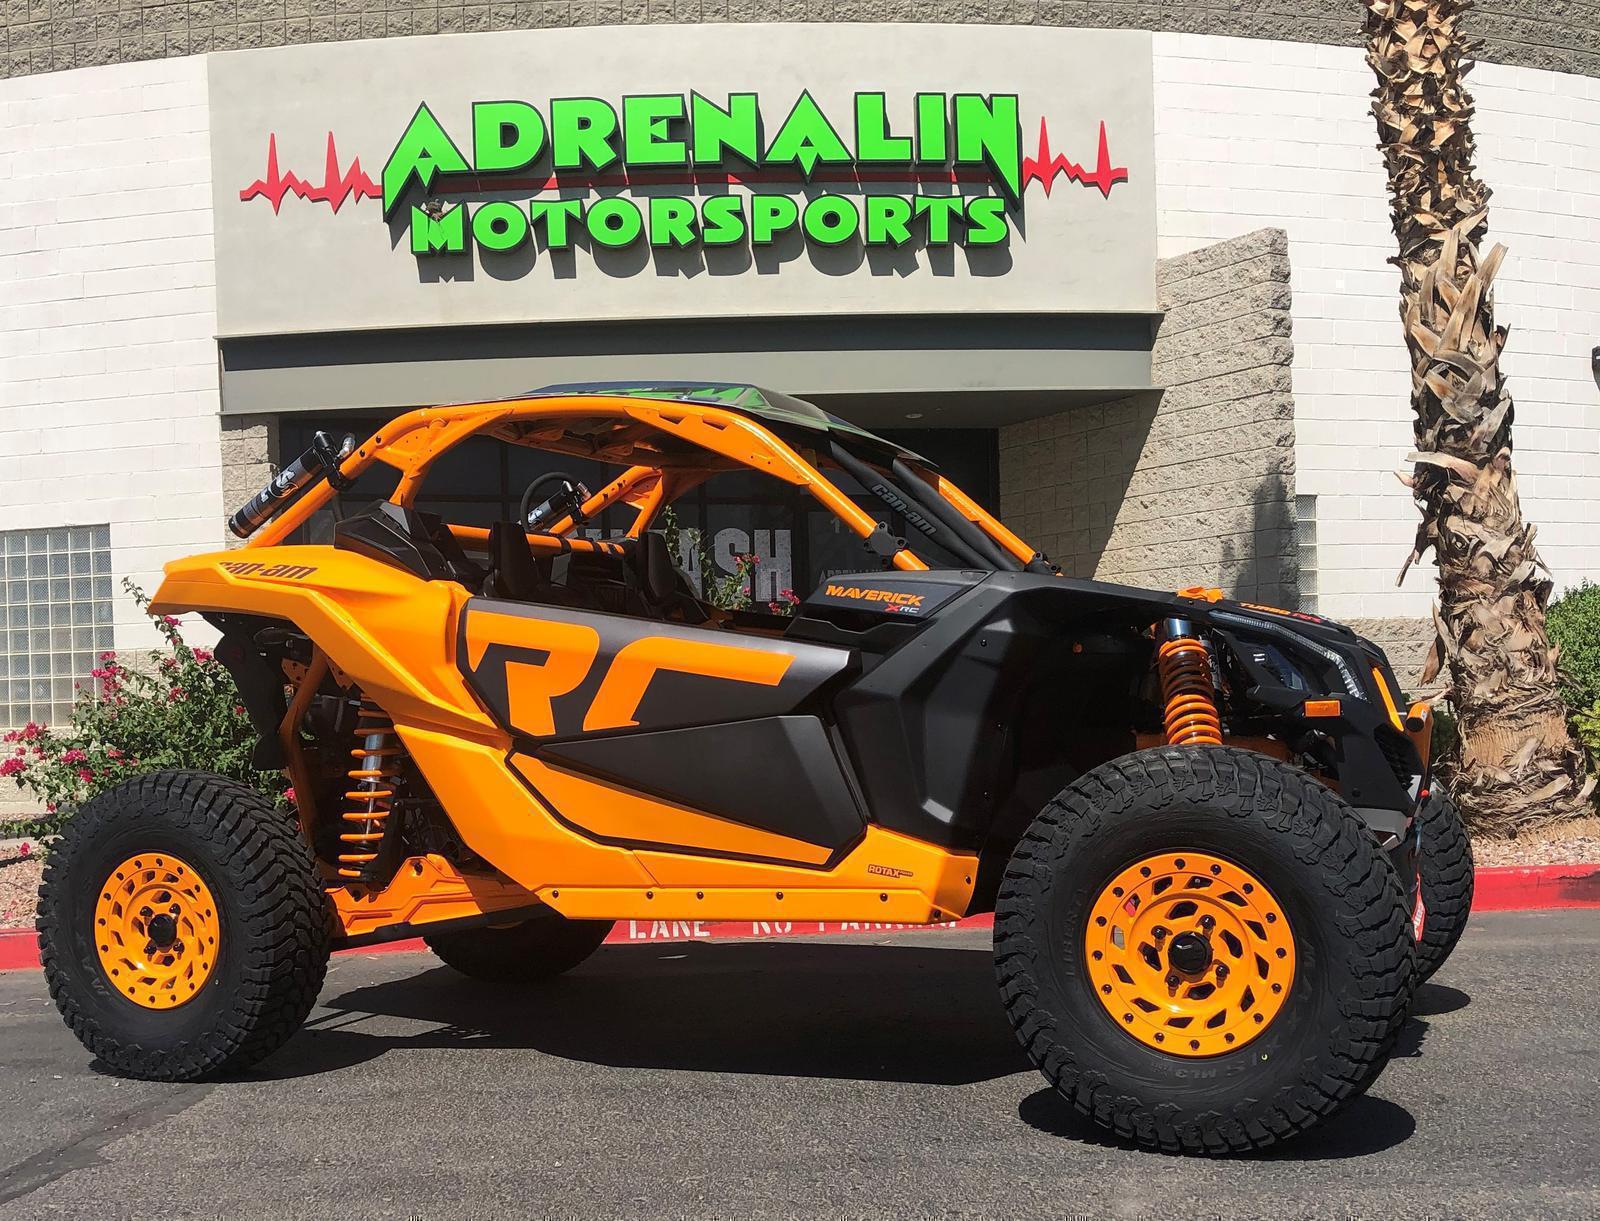 Inventory Adrenalin Motorsports Casa Grande, AZ (520) 836-0583